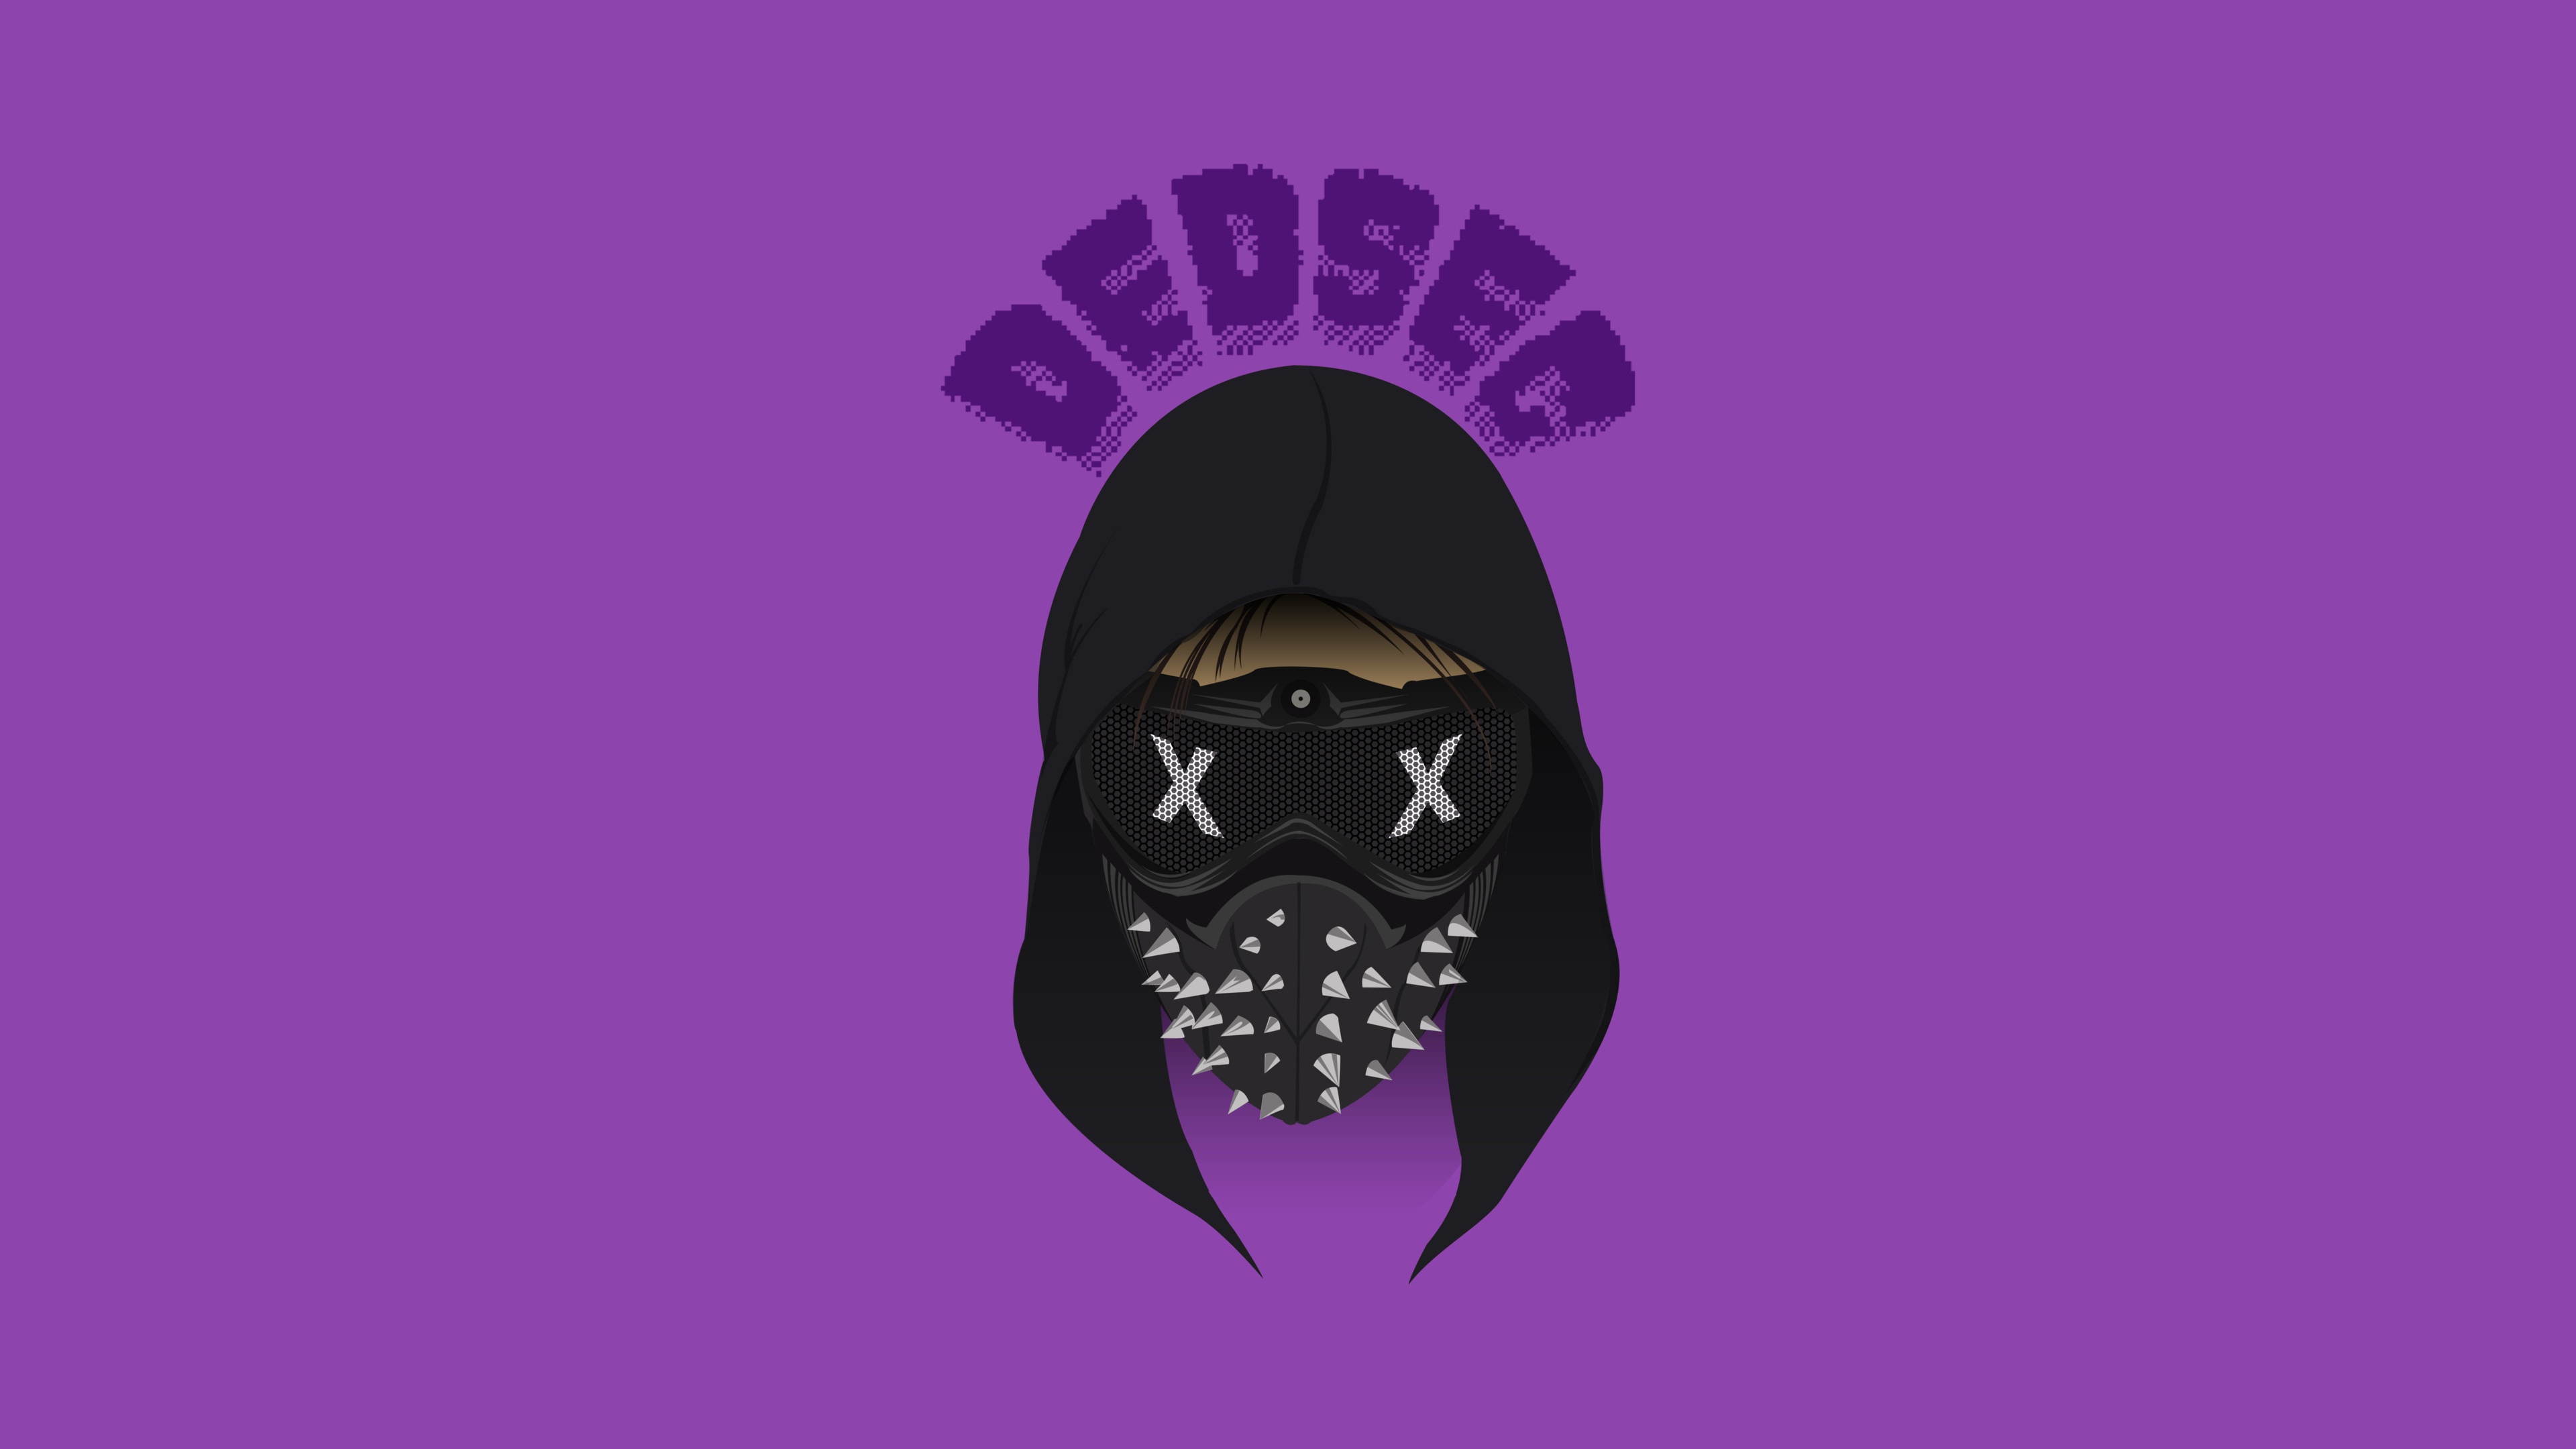 Download 3840x2400 Wallpaper Dedsec Watch Dogs 2 Minimal Purple